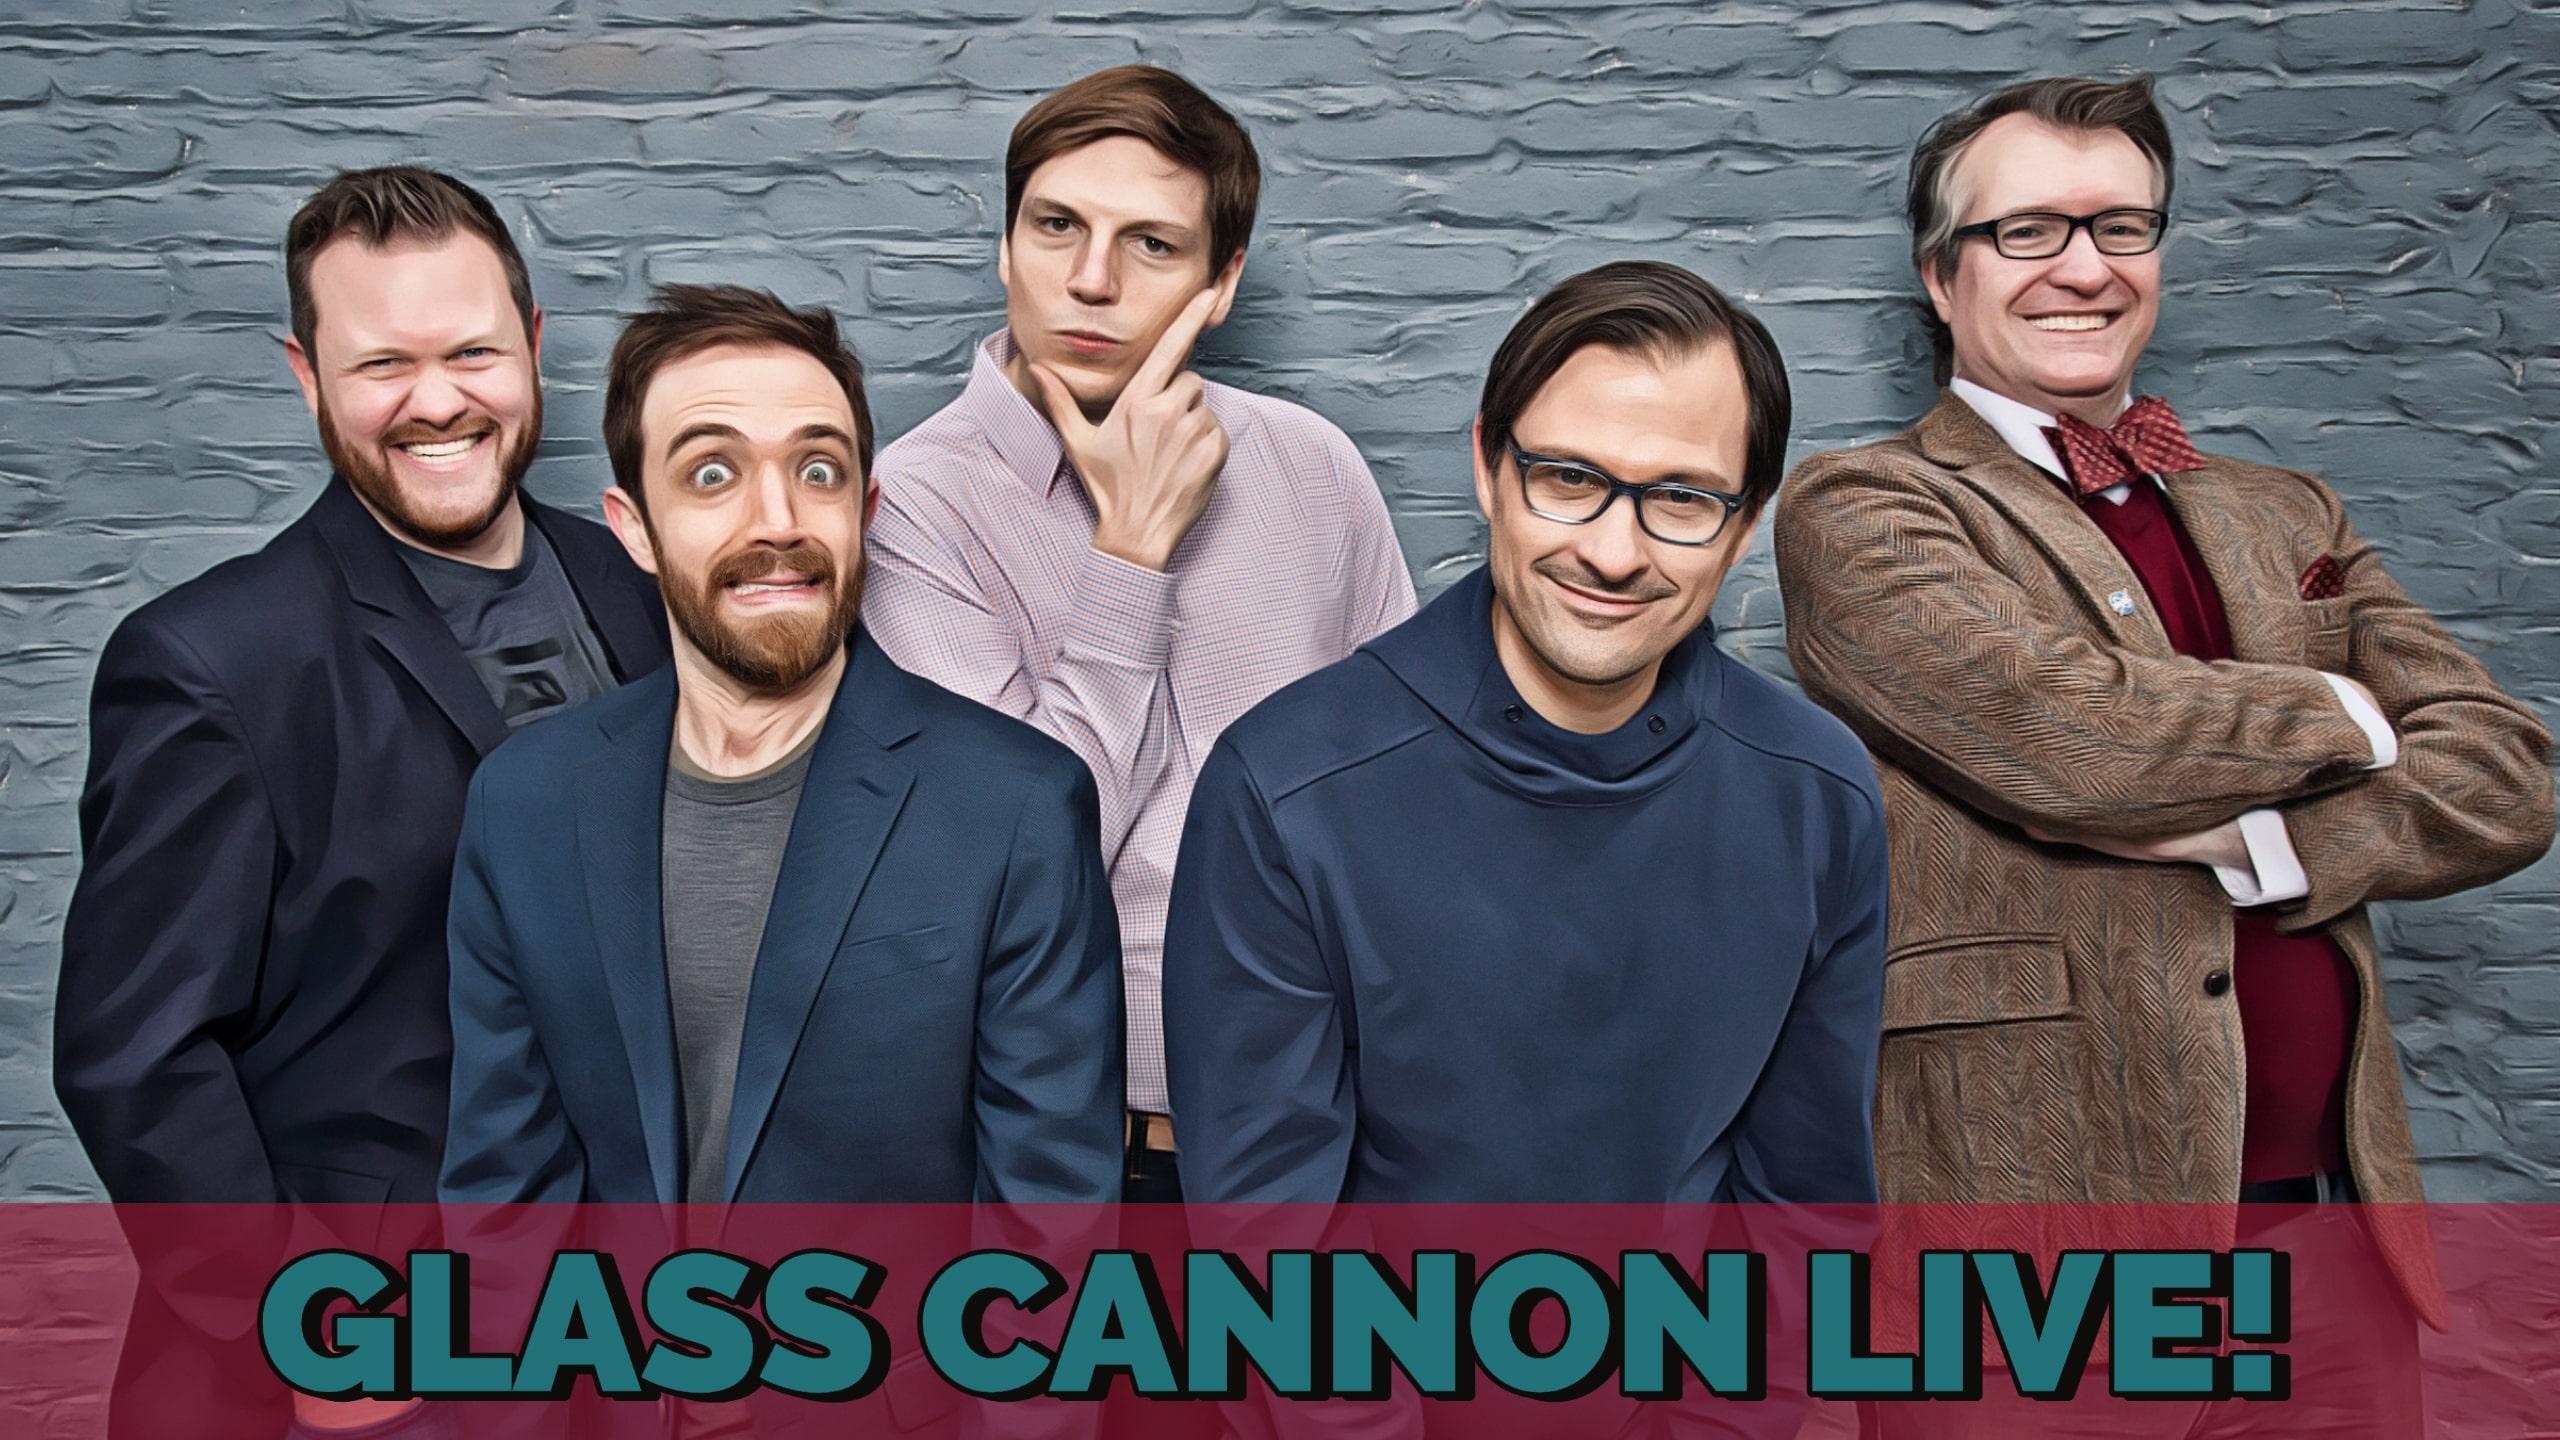 Glass Cannon Live!: